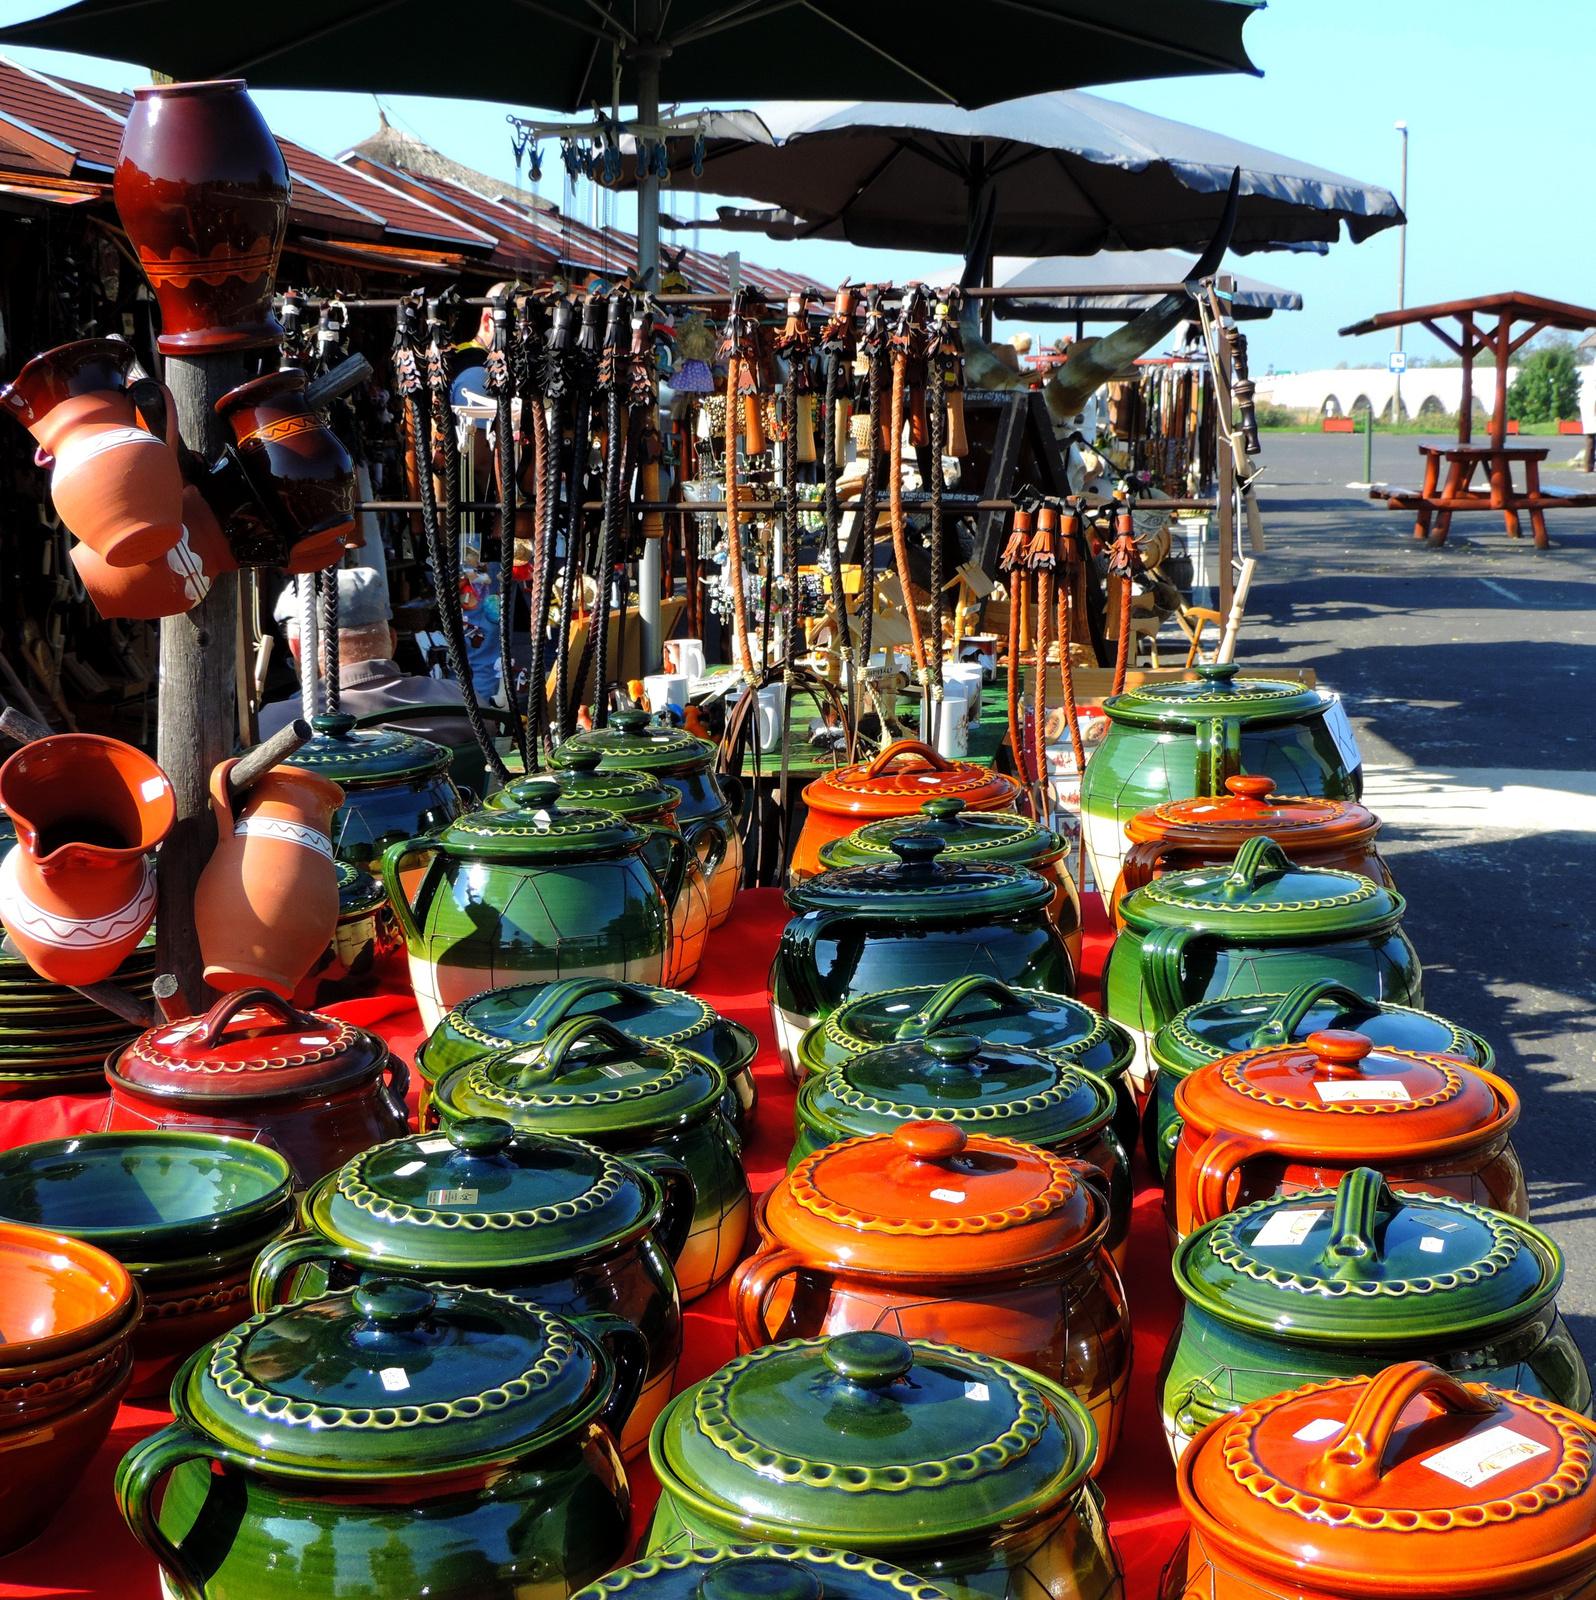 Hidi-vásár